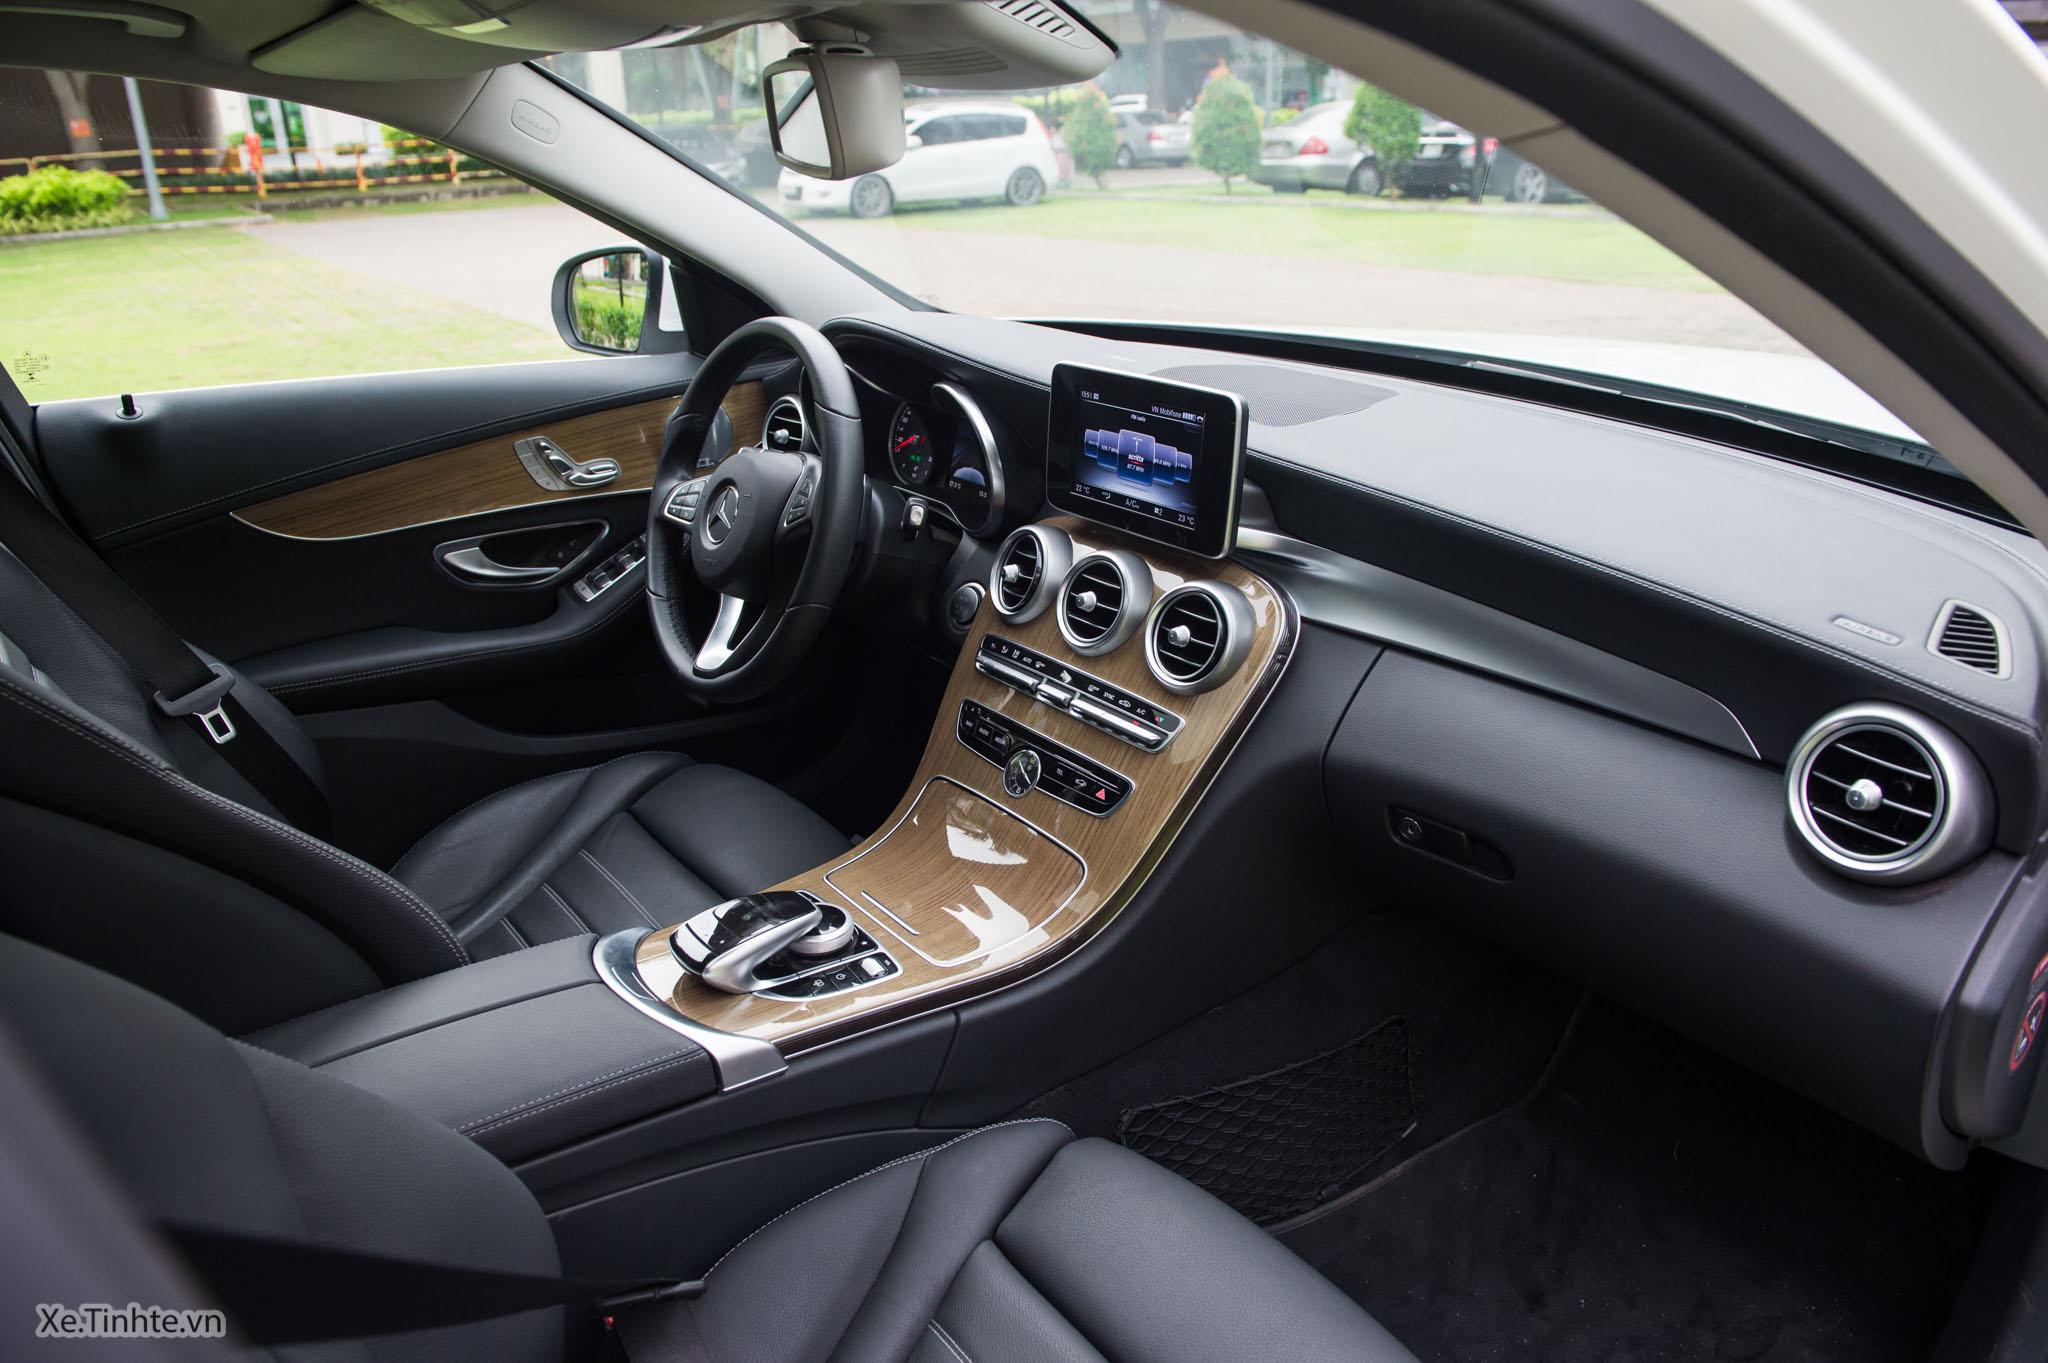 Mercedes_C250 Exclusive_Xe.tinhte.vn-7286.jpg